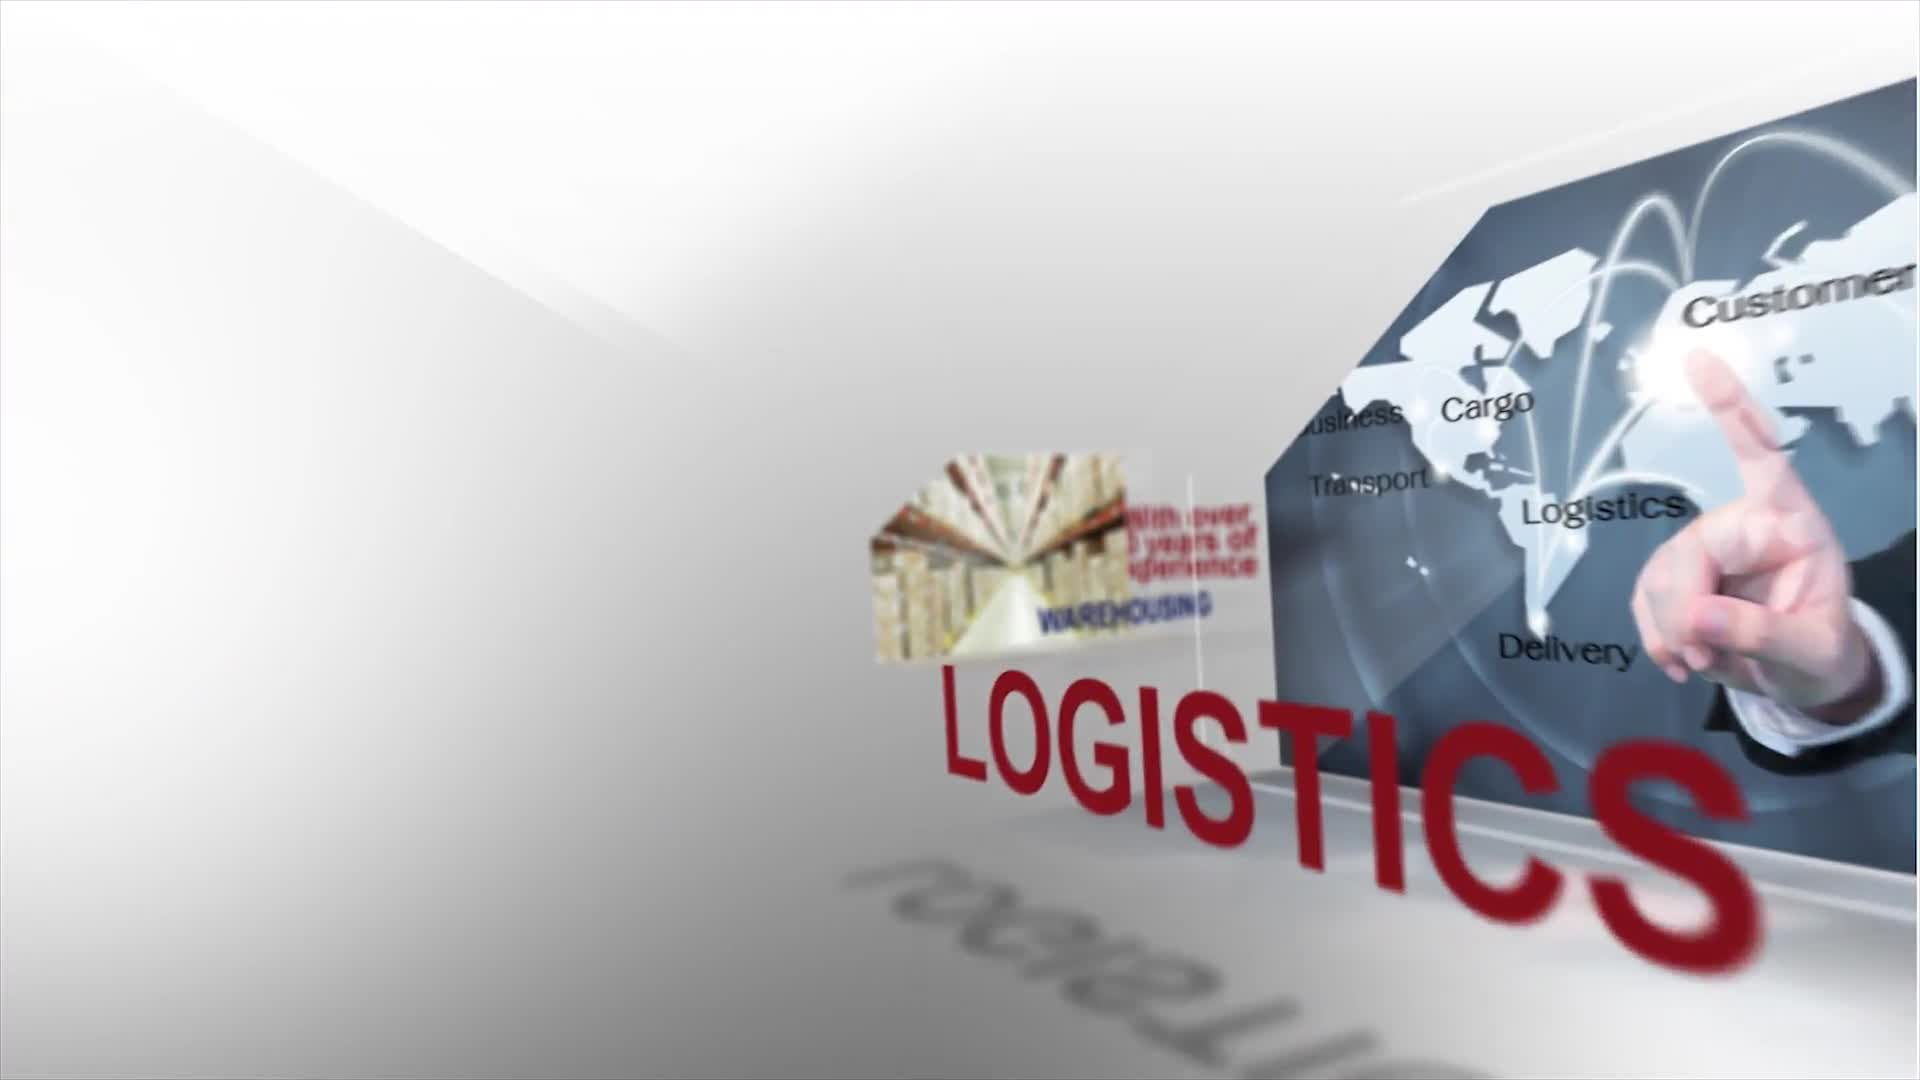 ByExpress Logistics & Transportation - Transportation Service - 1-877-781-1937